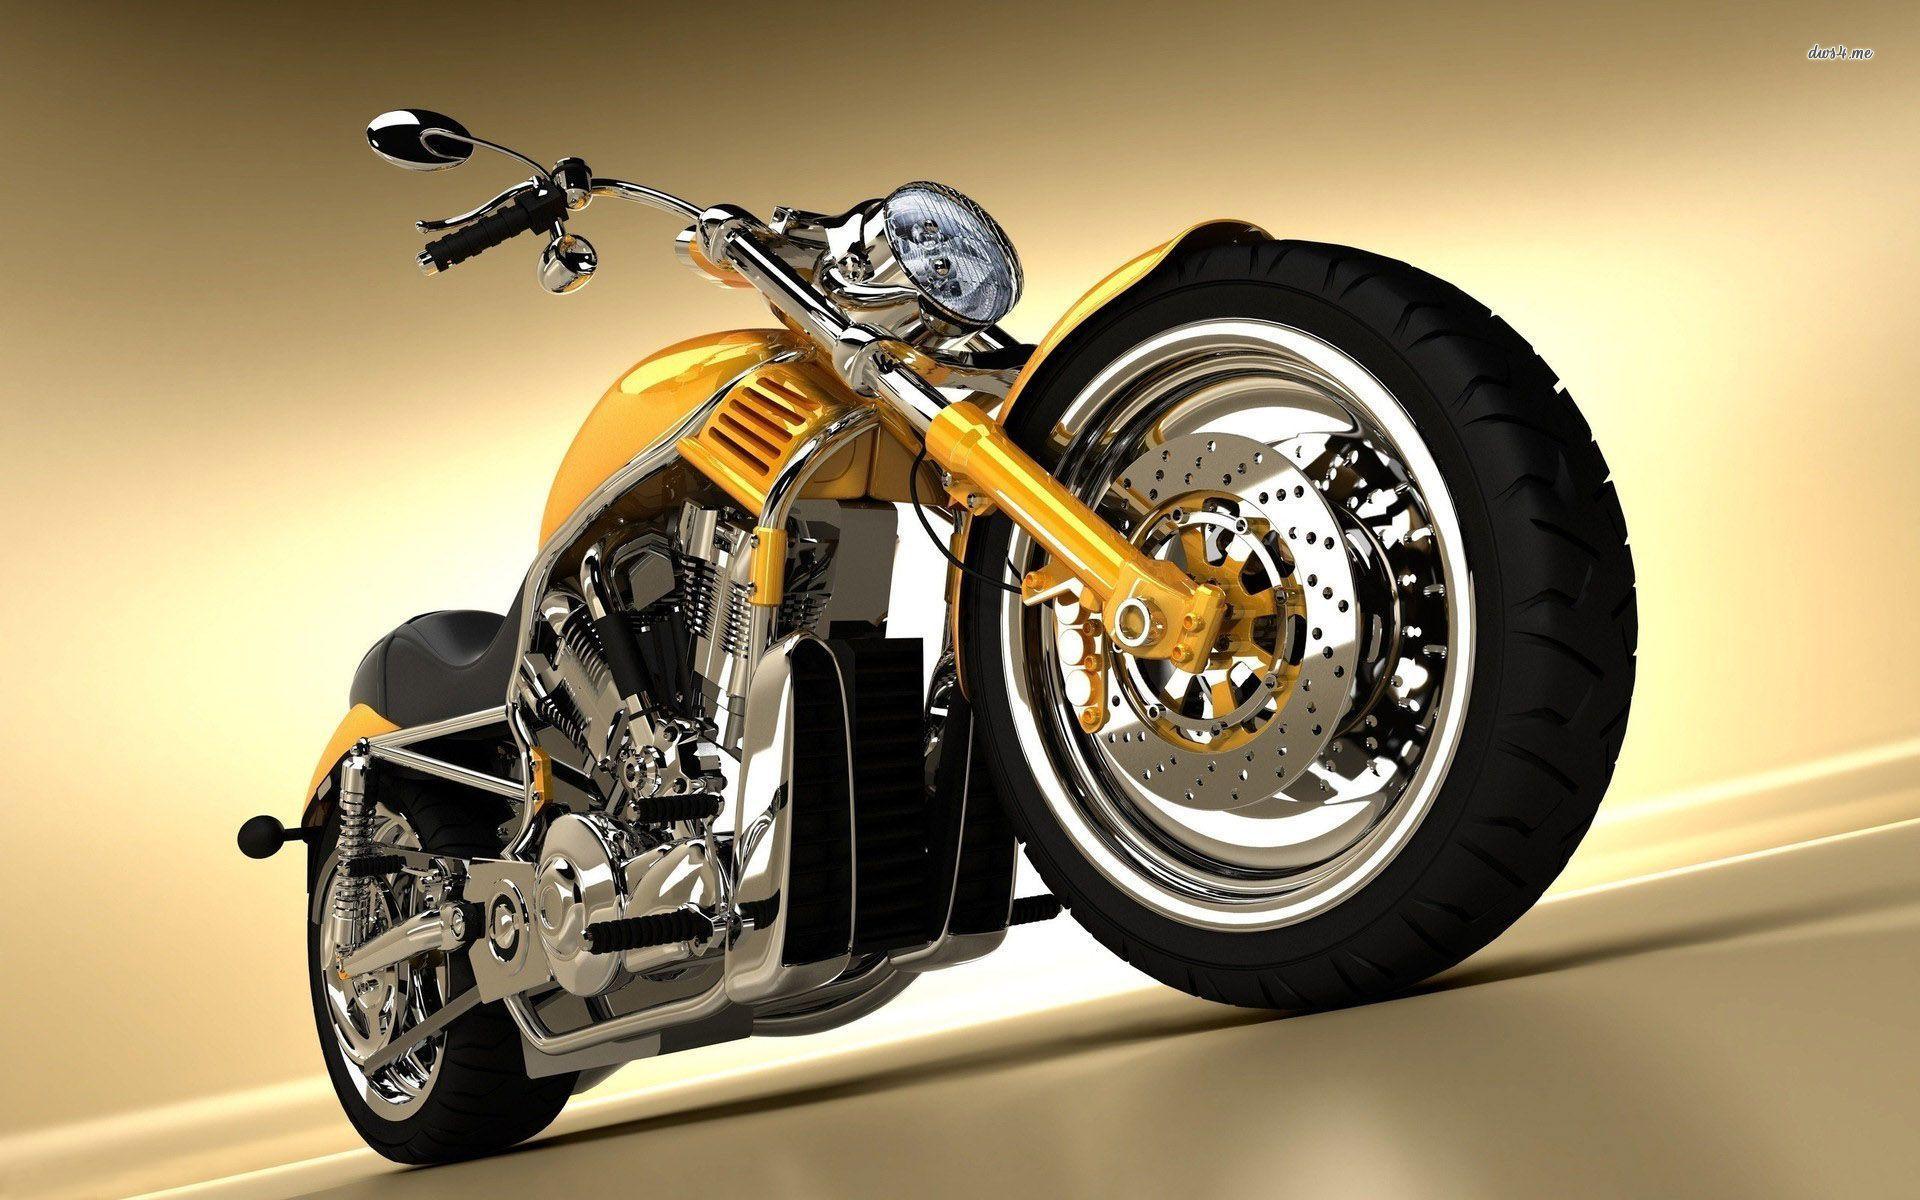 Harley Davidson Sportster Wallpapers - Wallpaper Cave | Beautiful ...